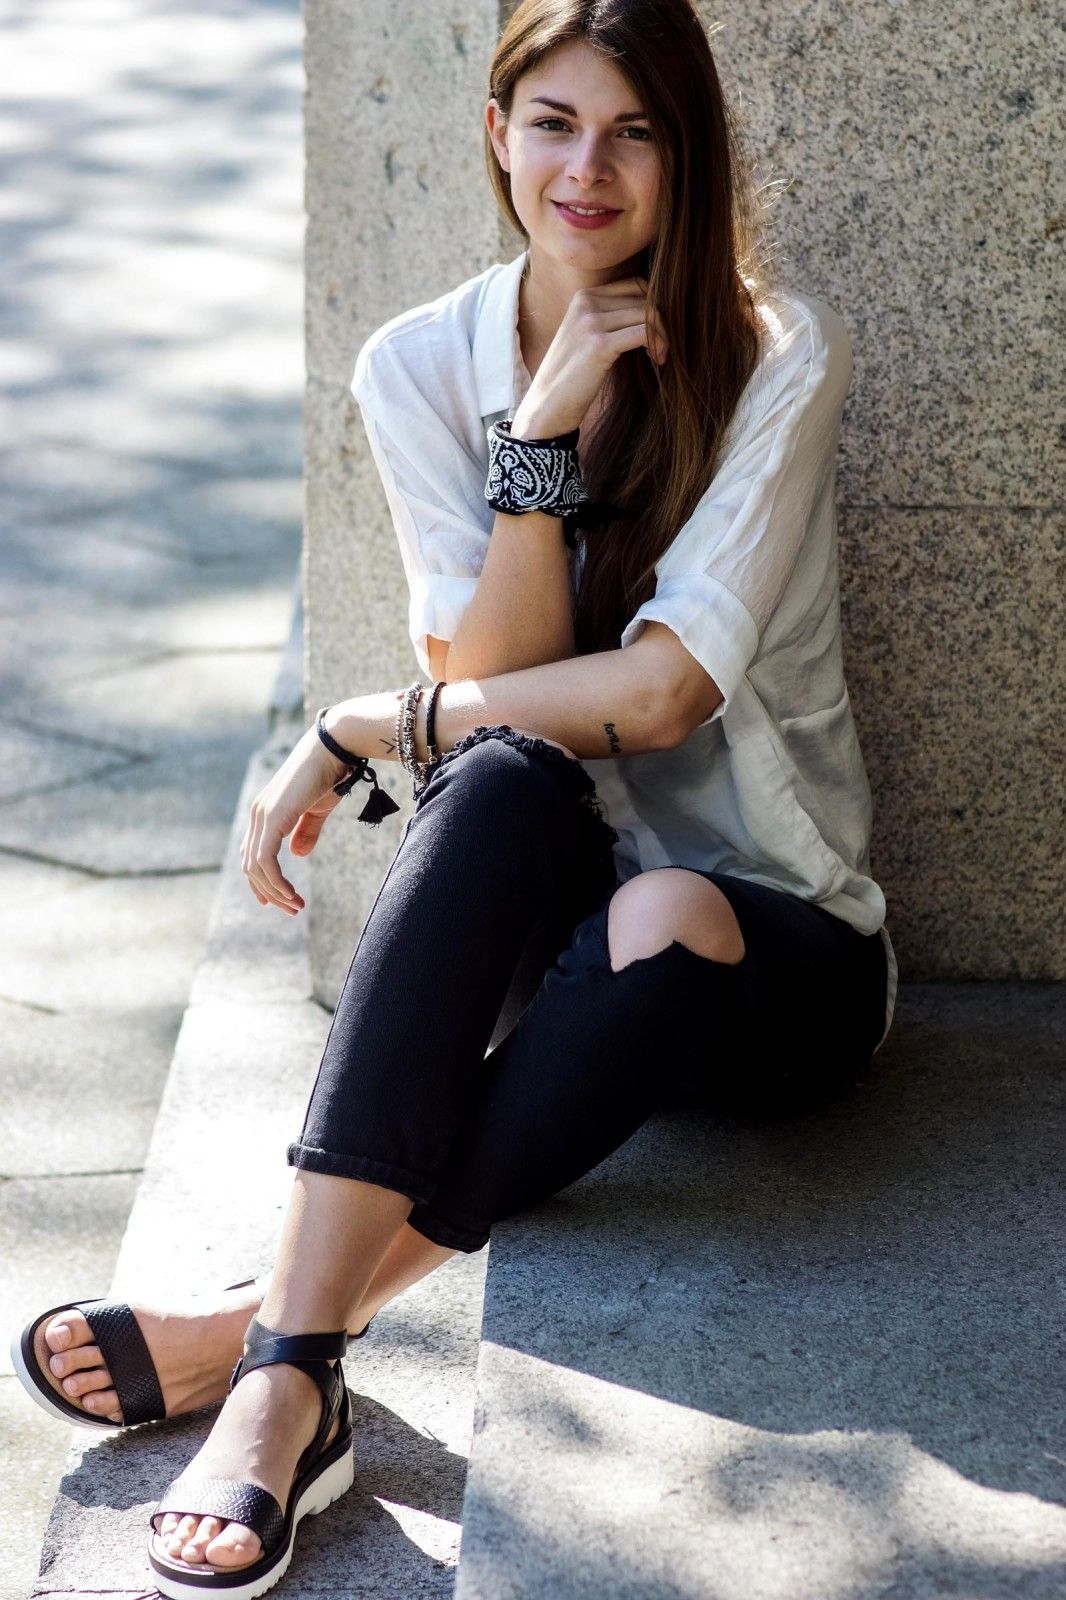 Wie trägt man zerrissene Jeans